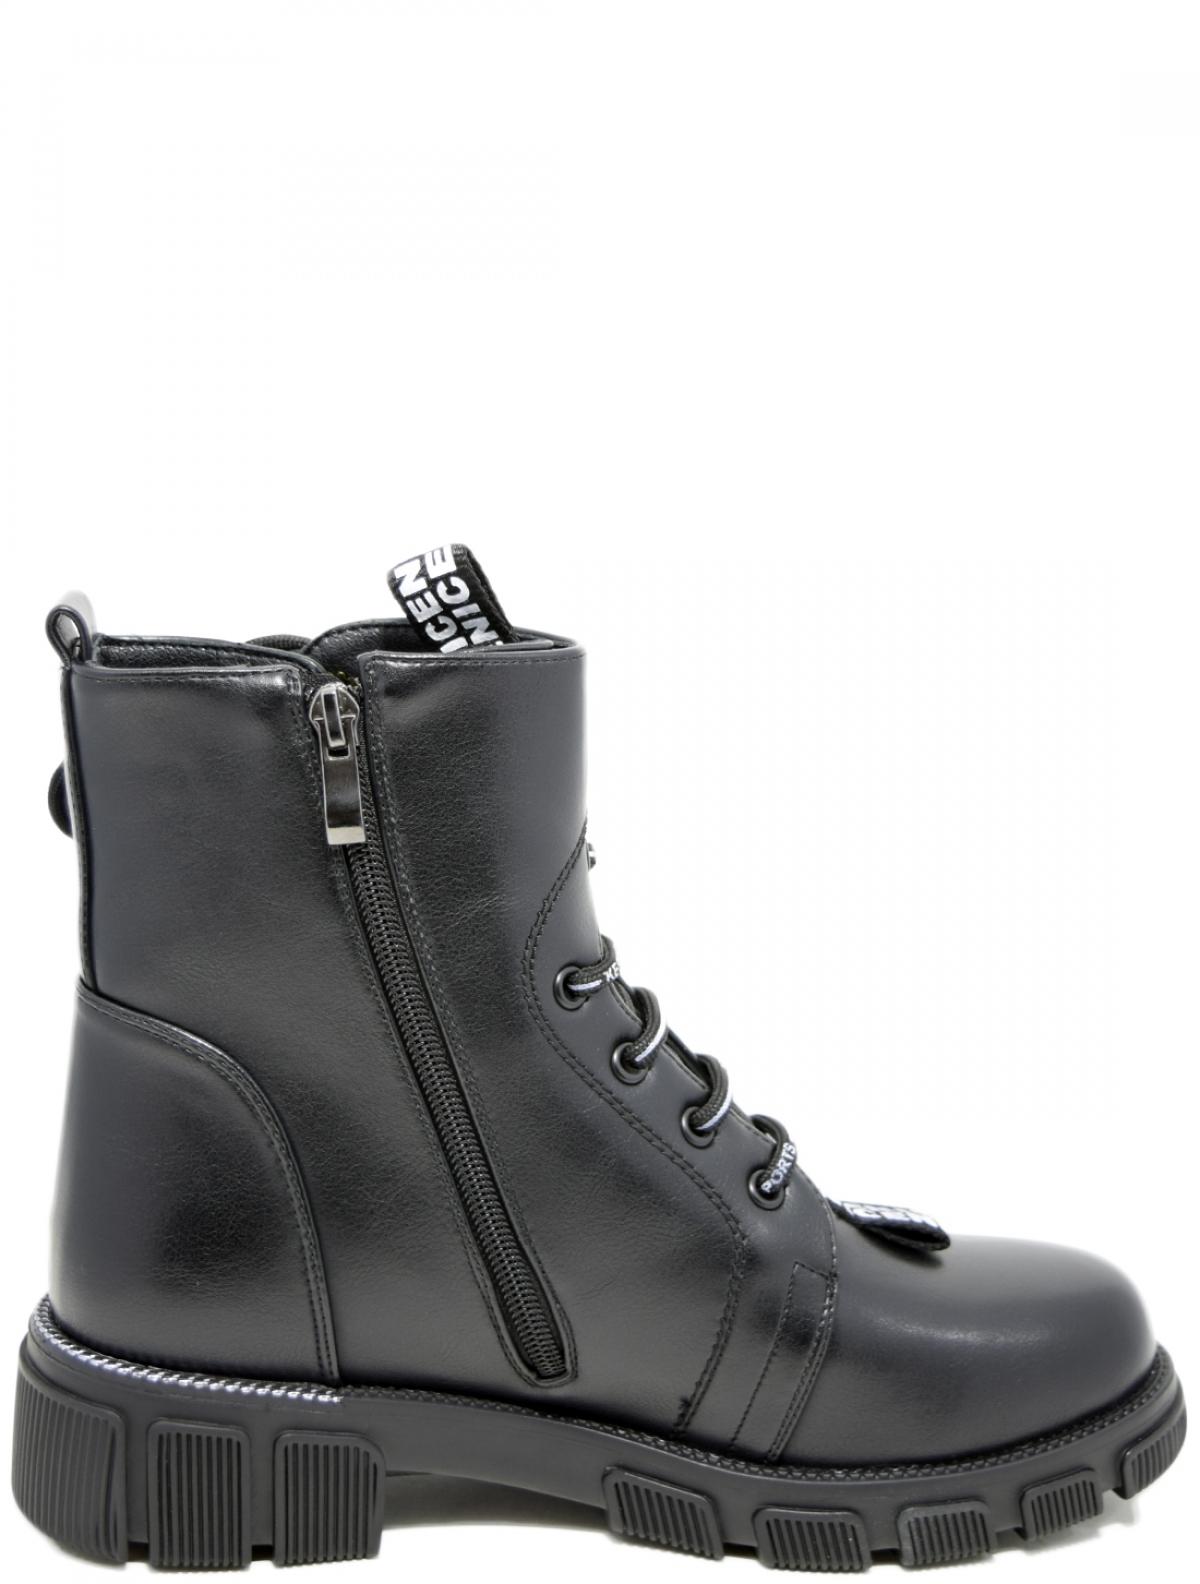 Admlis 7362 женские ботинки